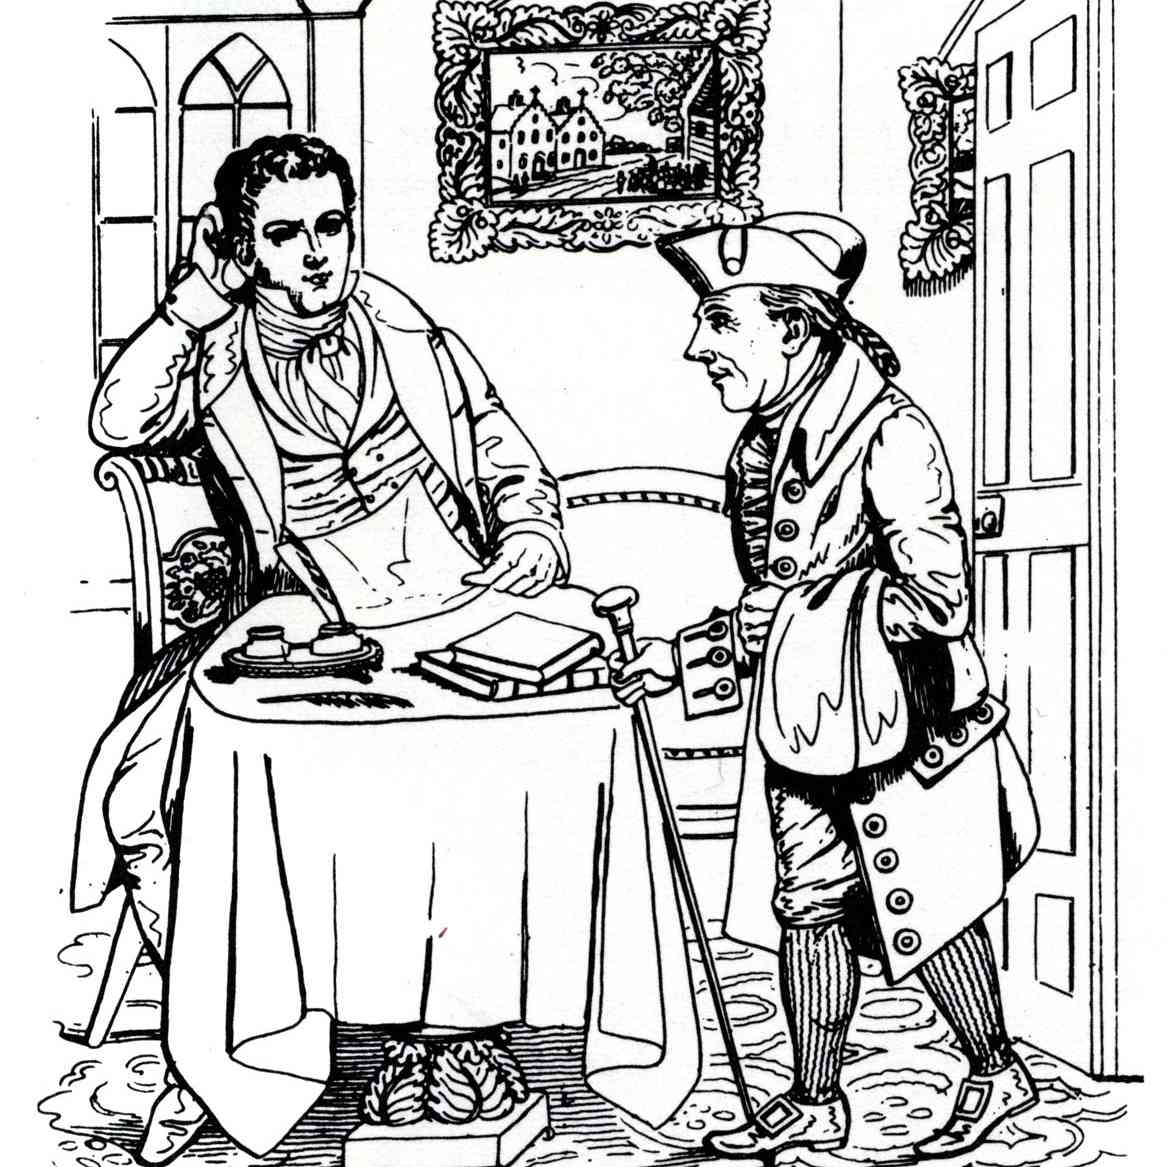 "Diedrich Knickerbocker (rechts) ist Washington Irvings Erzähler in ""A History of New York""."